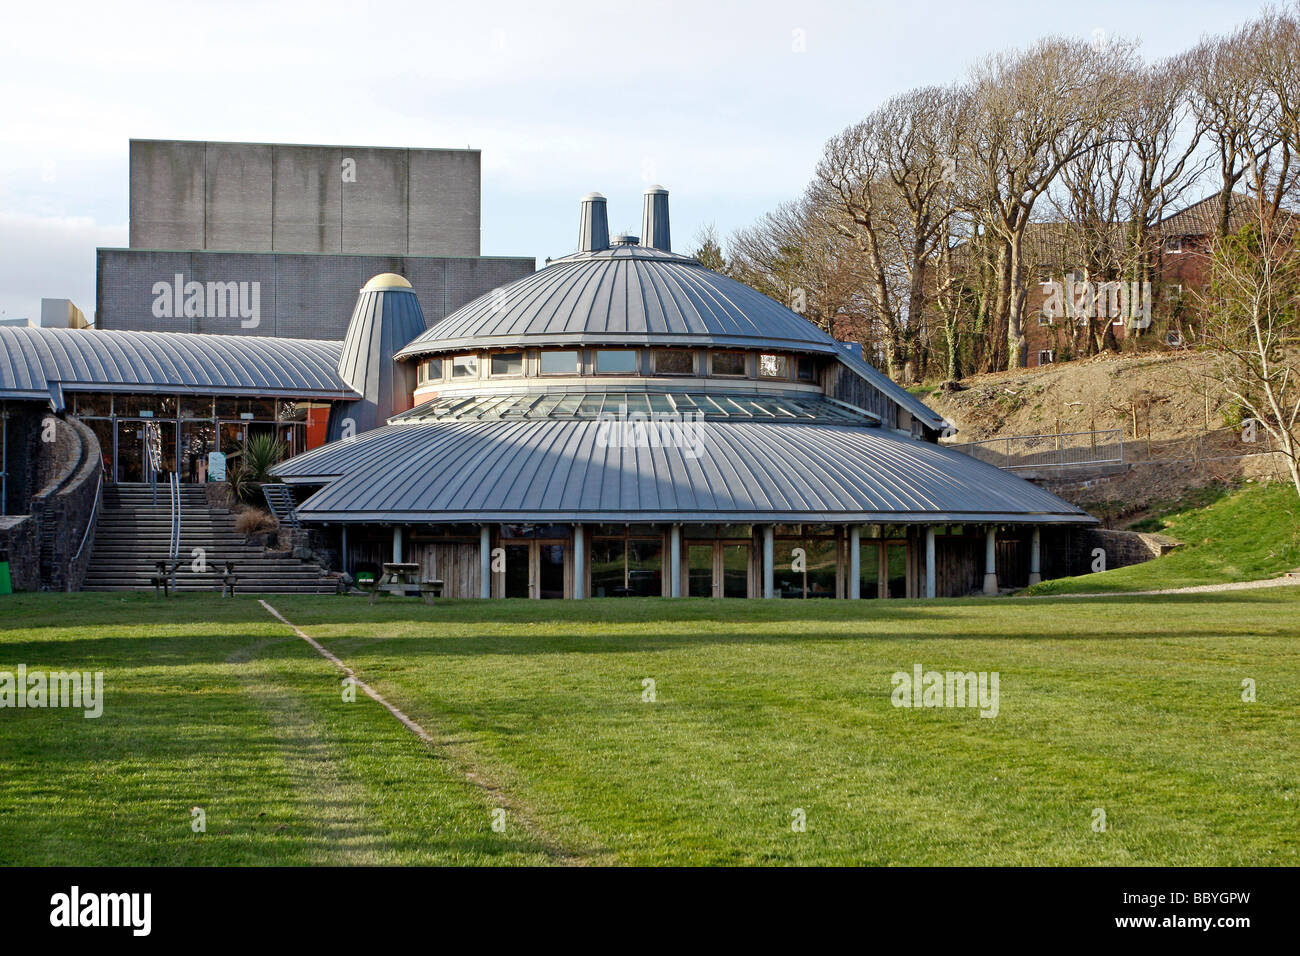 Aberystwyth Arts Centre Aberystwyth University Ceredigion West Wales UK Stock Photo